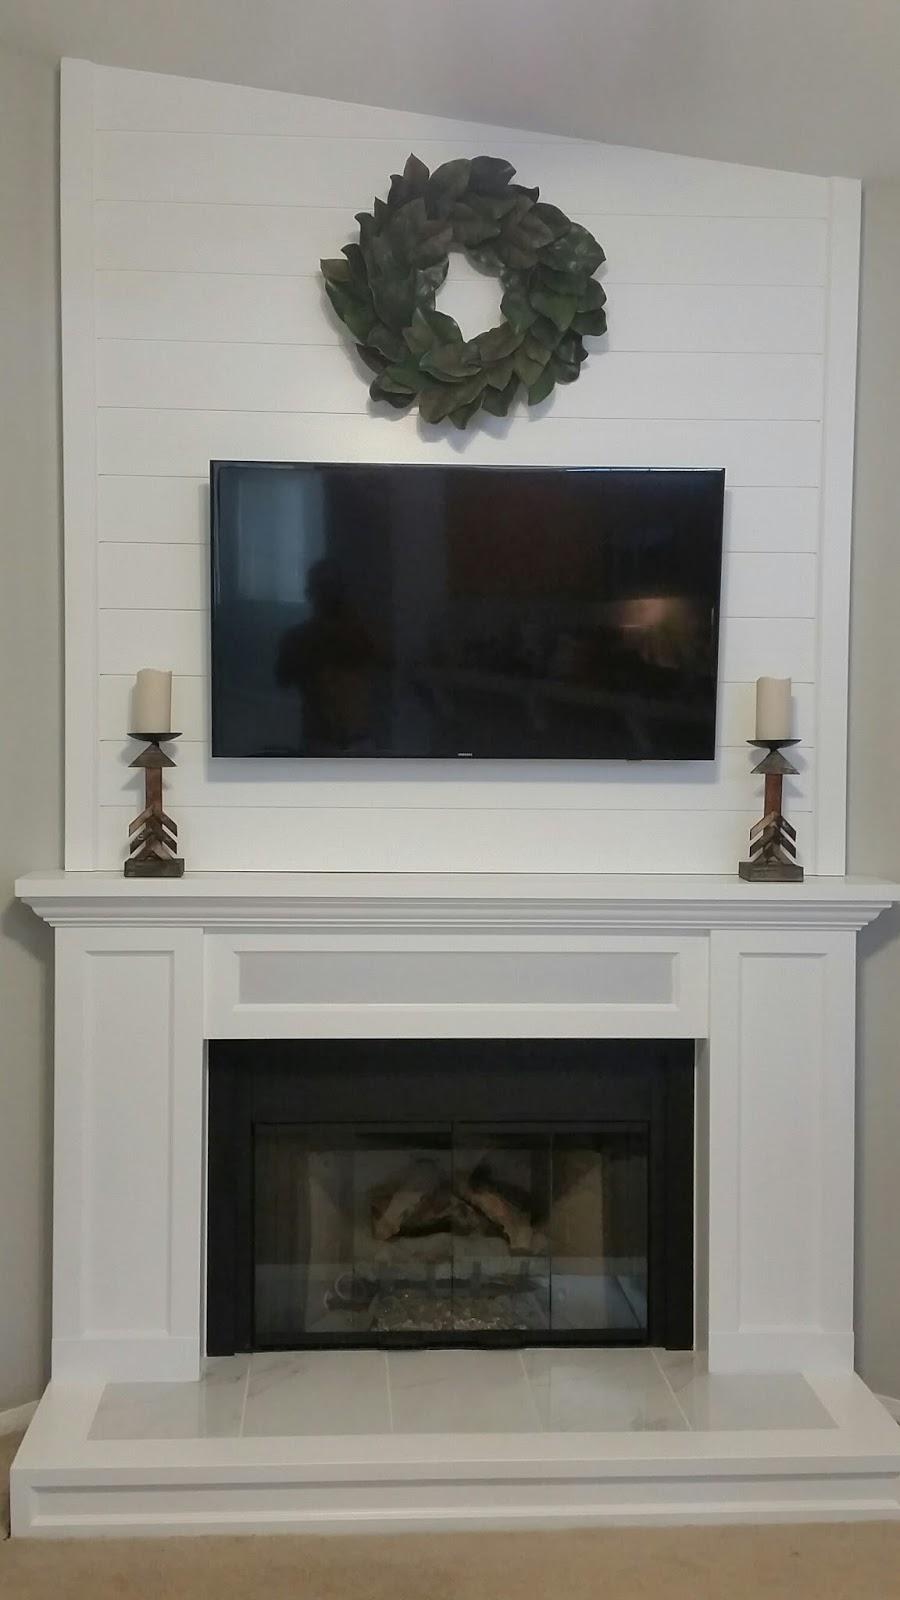 soundbar in fireplace media mantle speakerworks com speakers